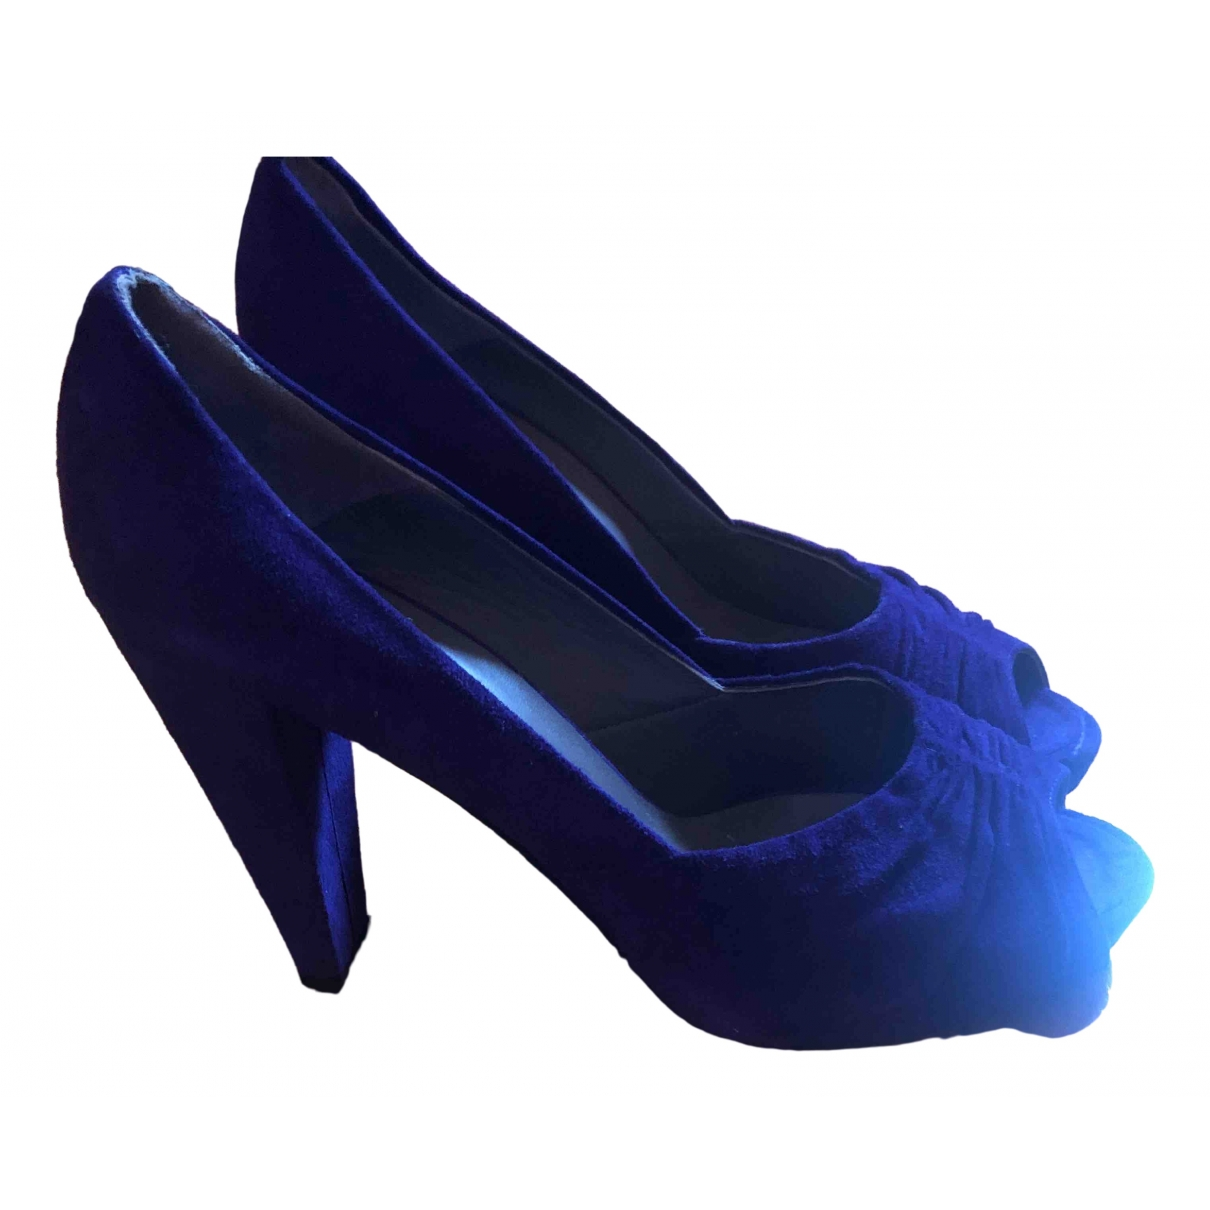 Castaner \N Purple Suede Heels for Women 40 IT